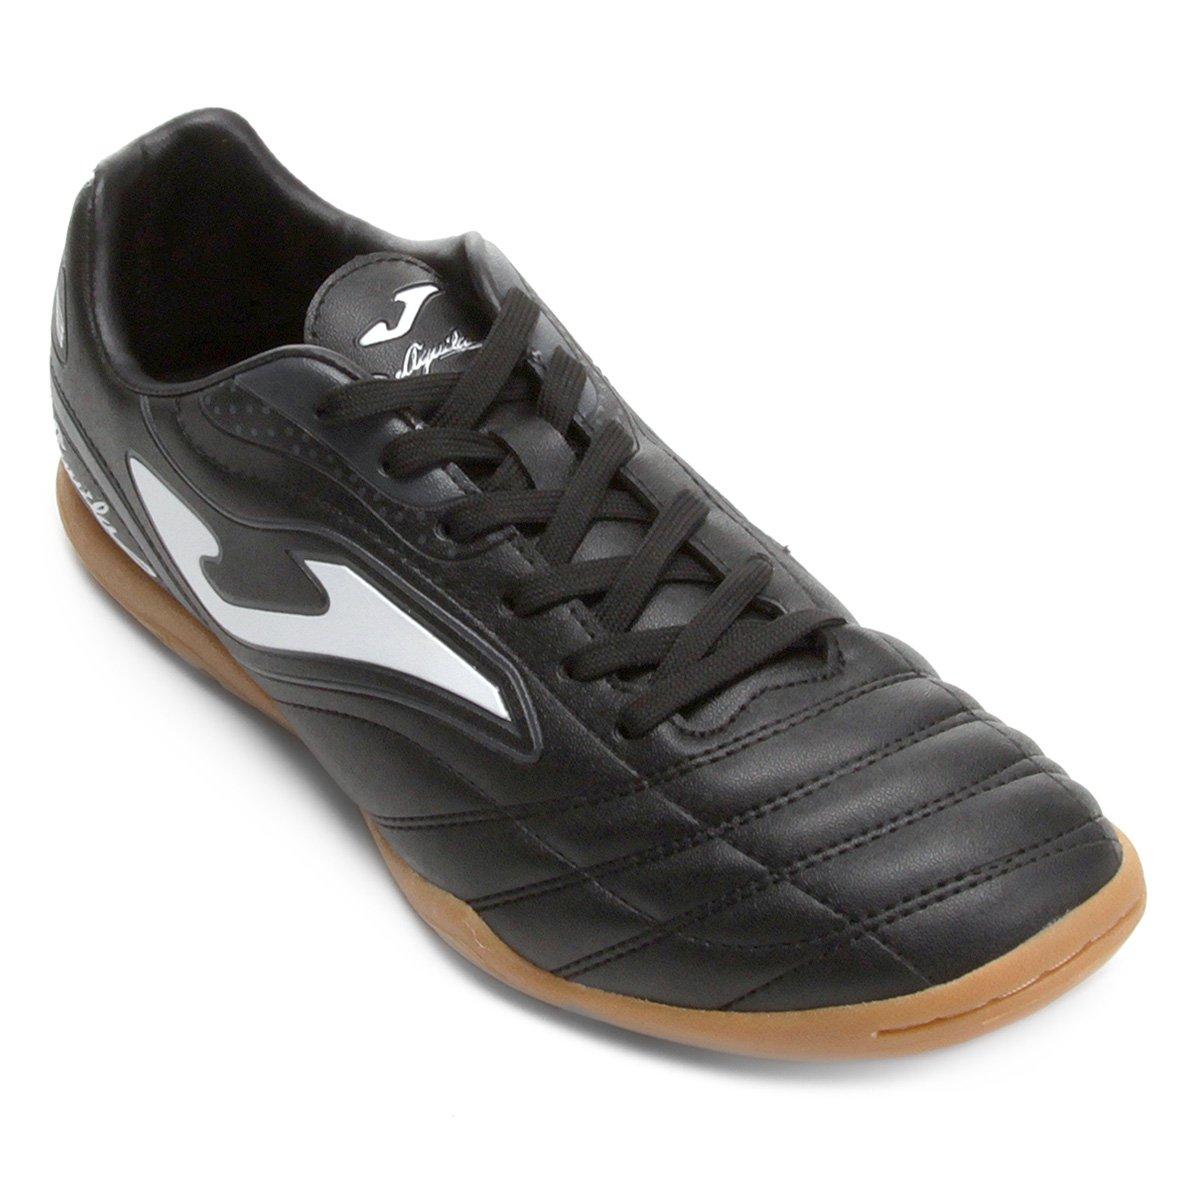 Chuteira Futsal Joma Aguila IN Masculina 20725d320edf8